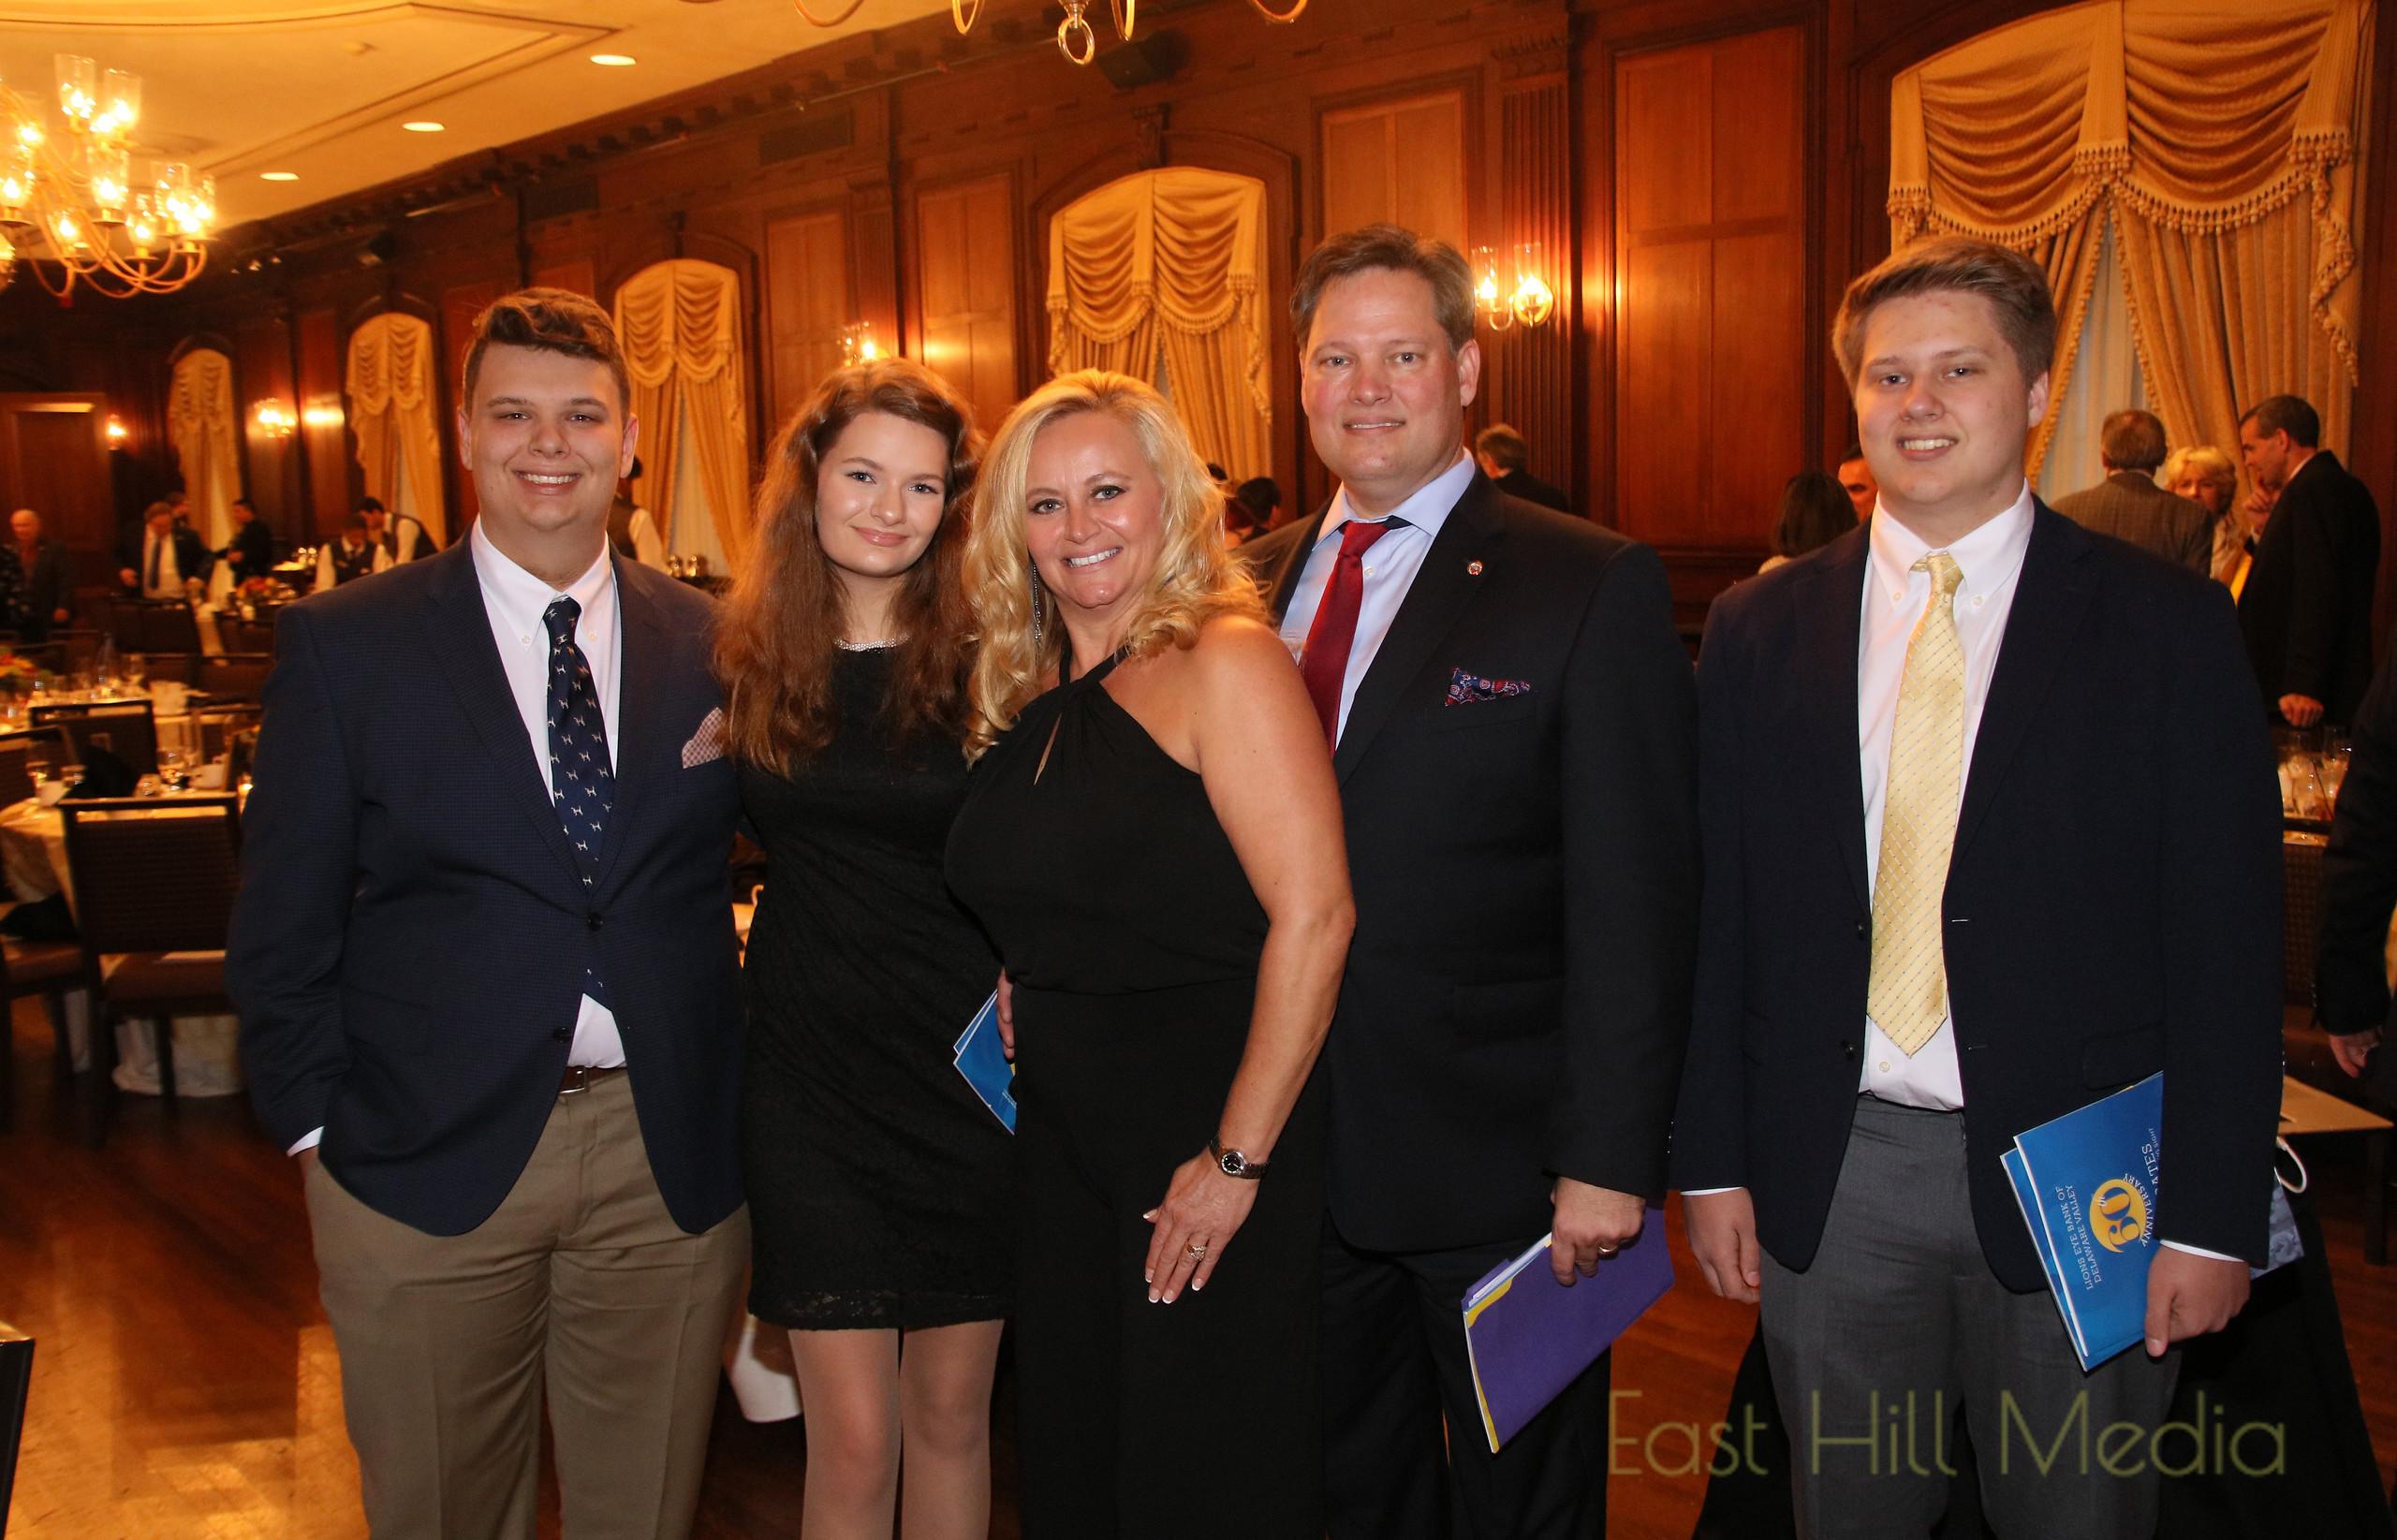 Lions Eye Bank 60th Anniversary Awards Ceremony